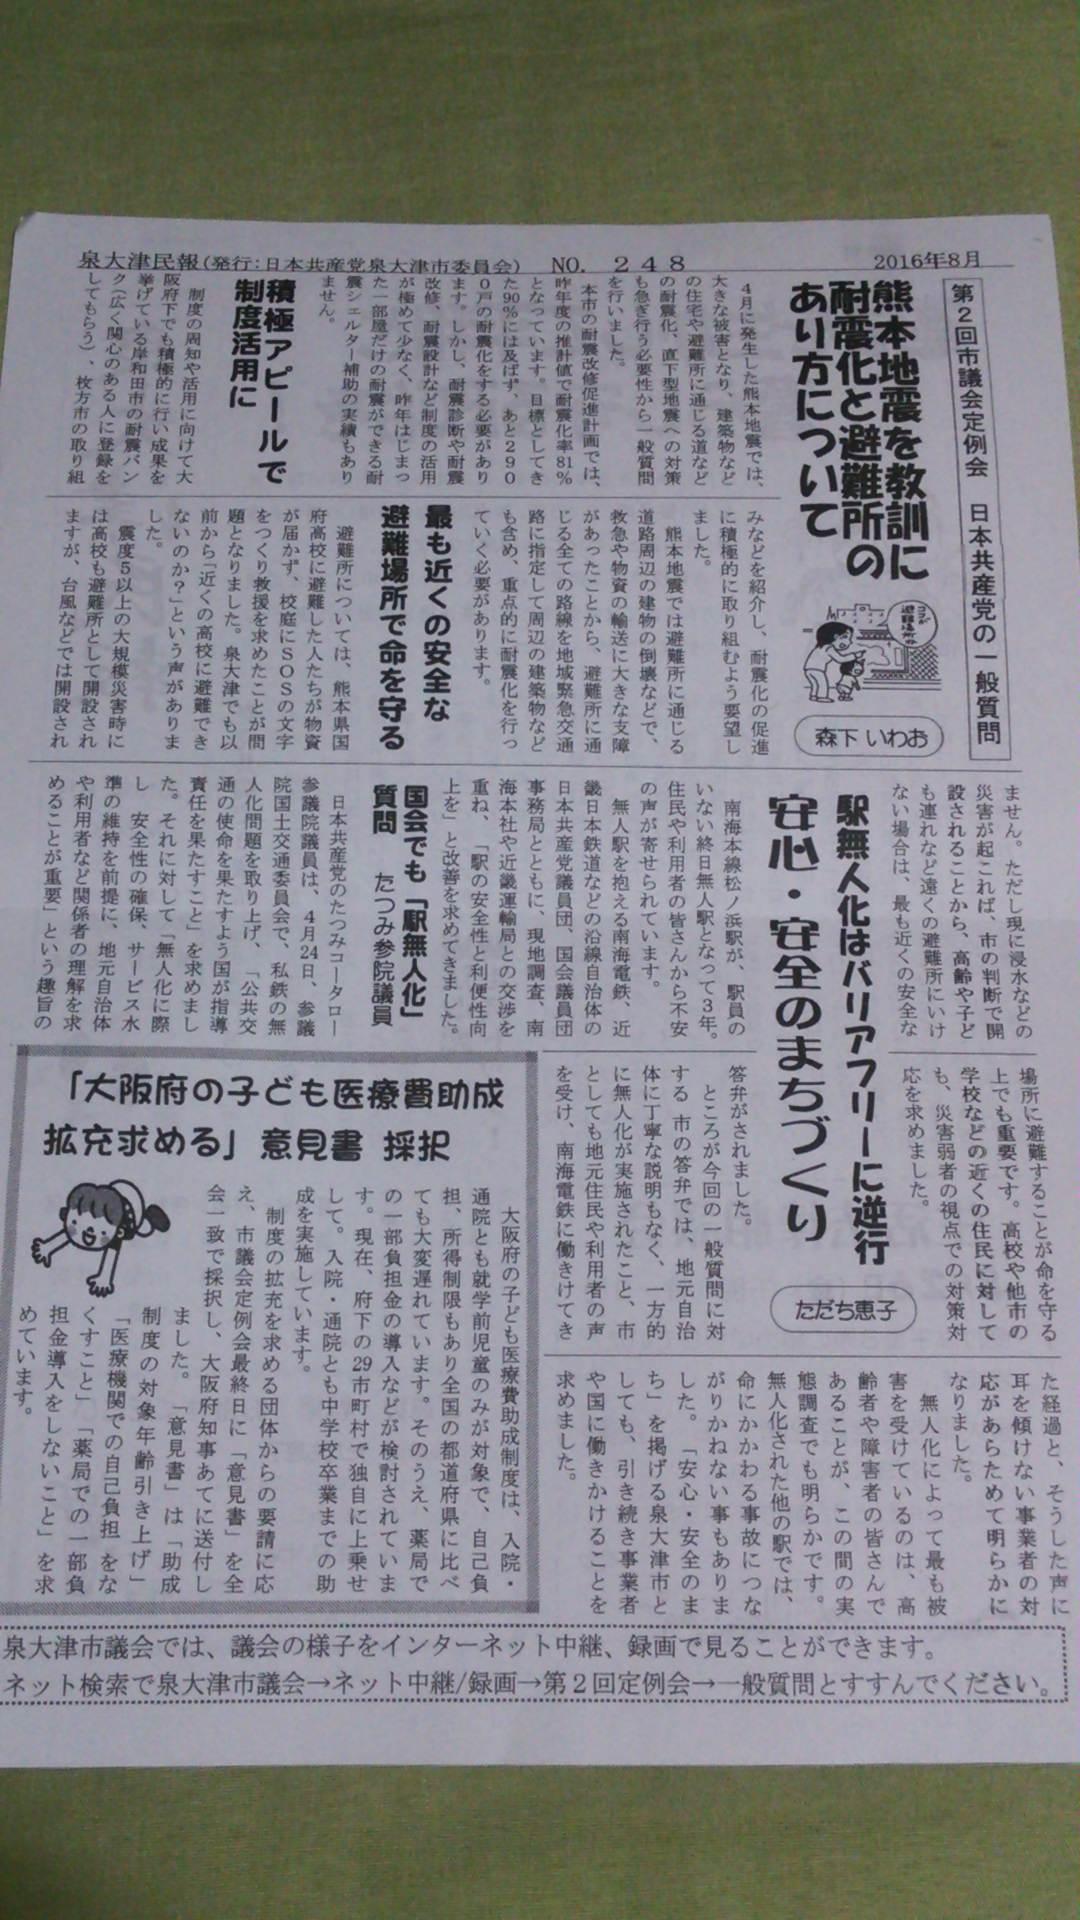 選挙、議会報告の泉大津民報を配布